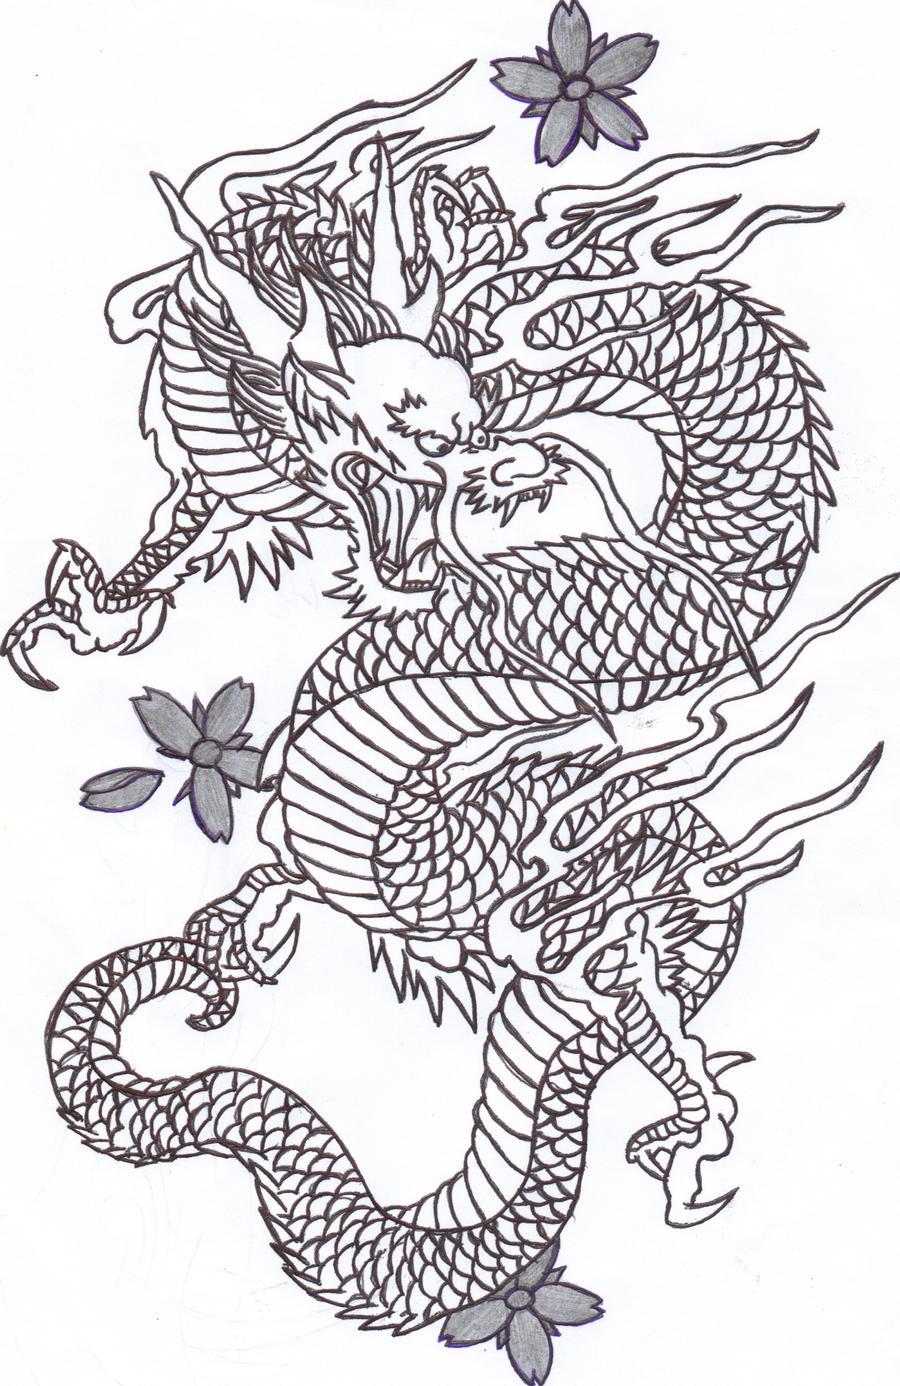 Chinese Dragon 2 By Sunshine vamp On DeviantArt